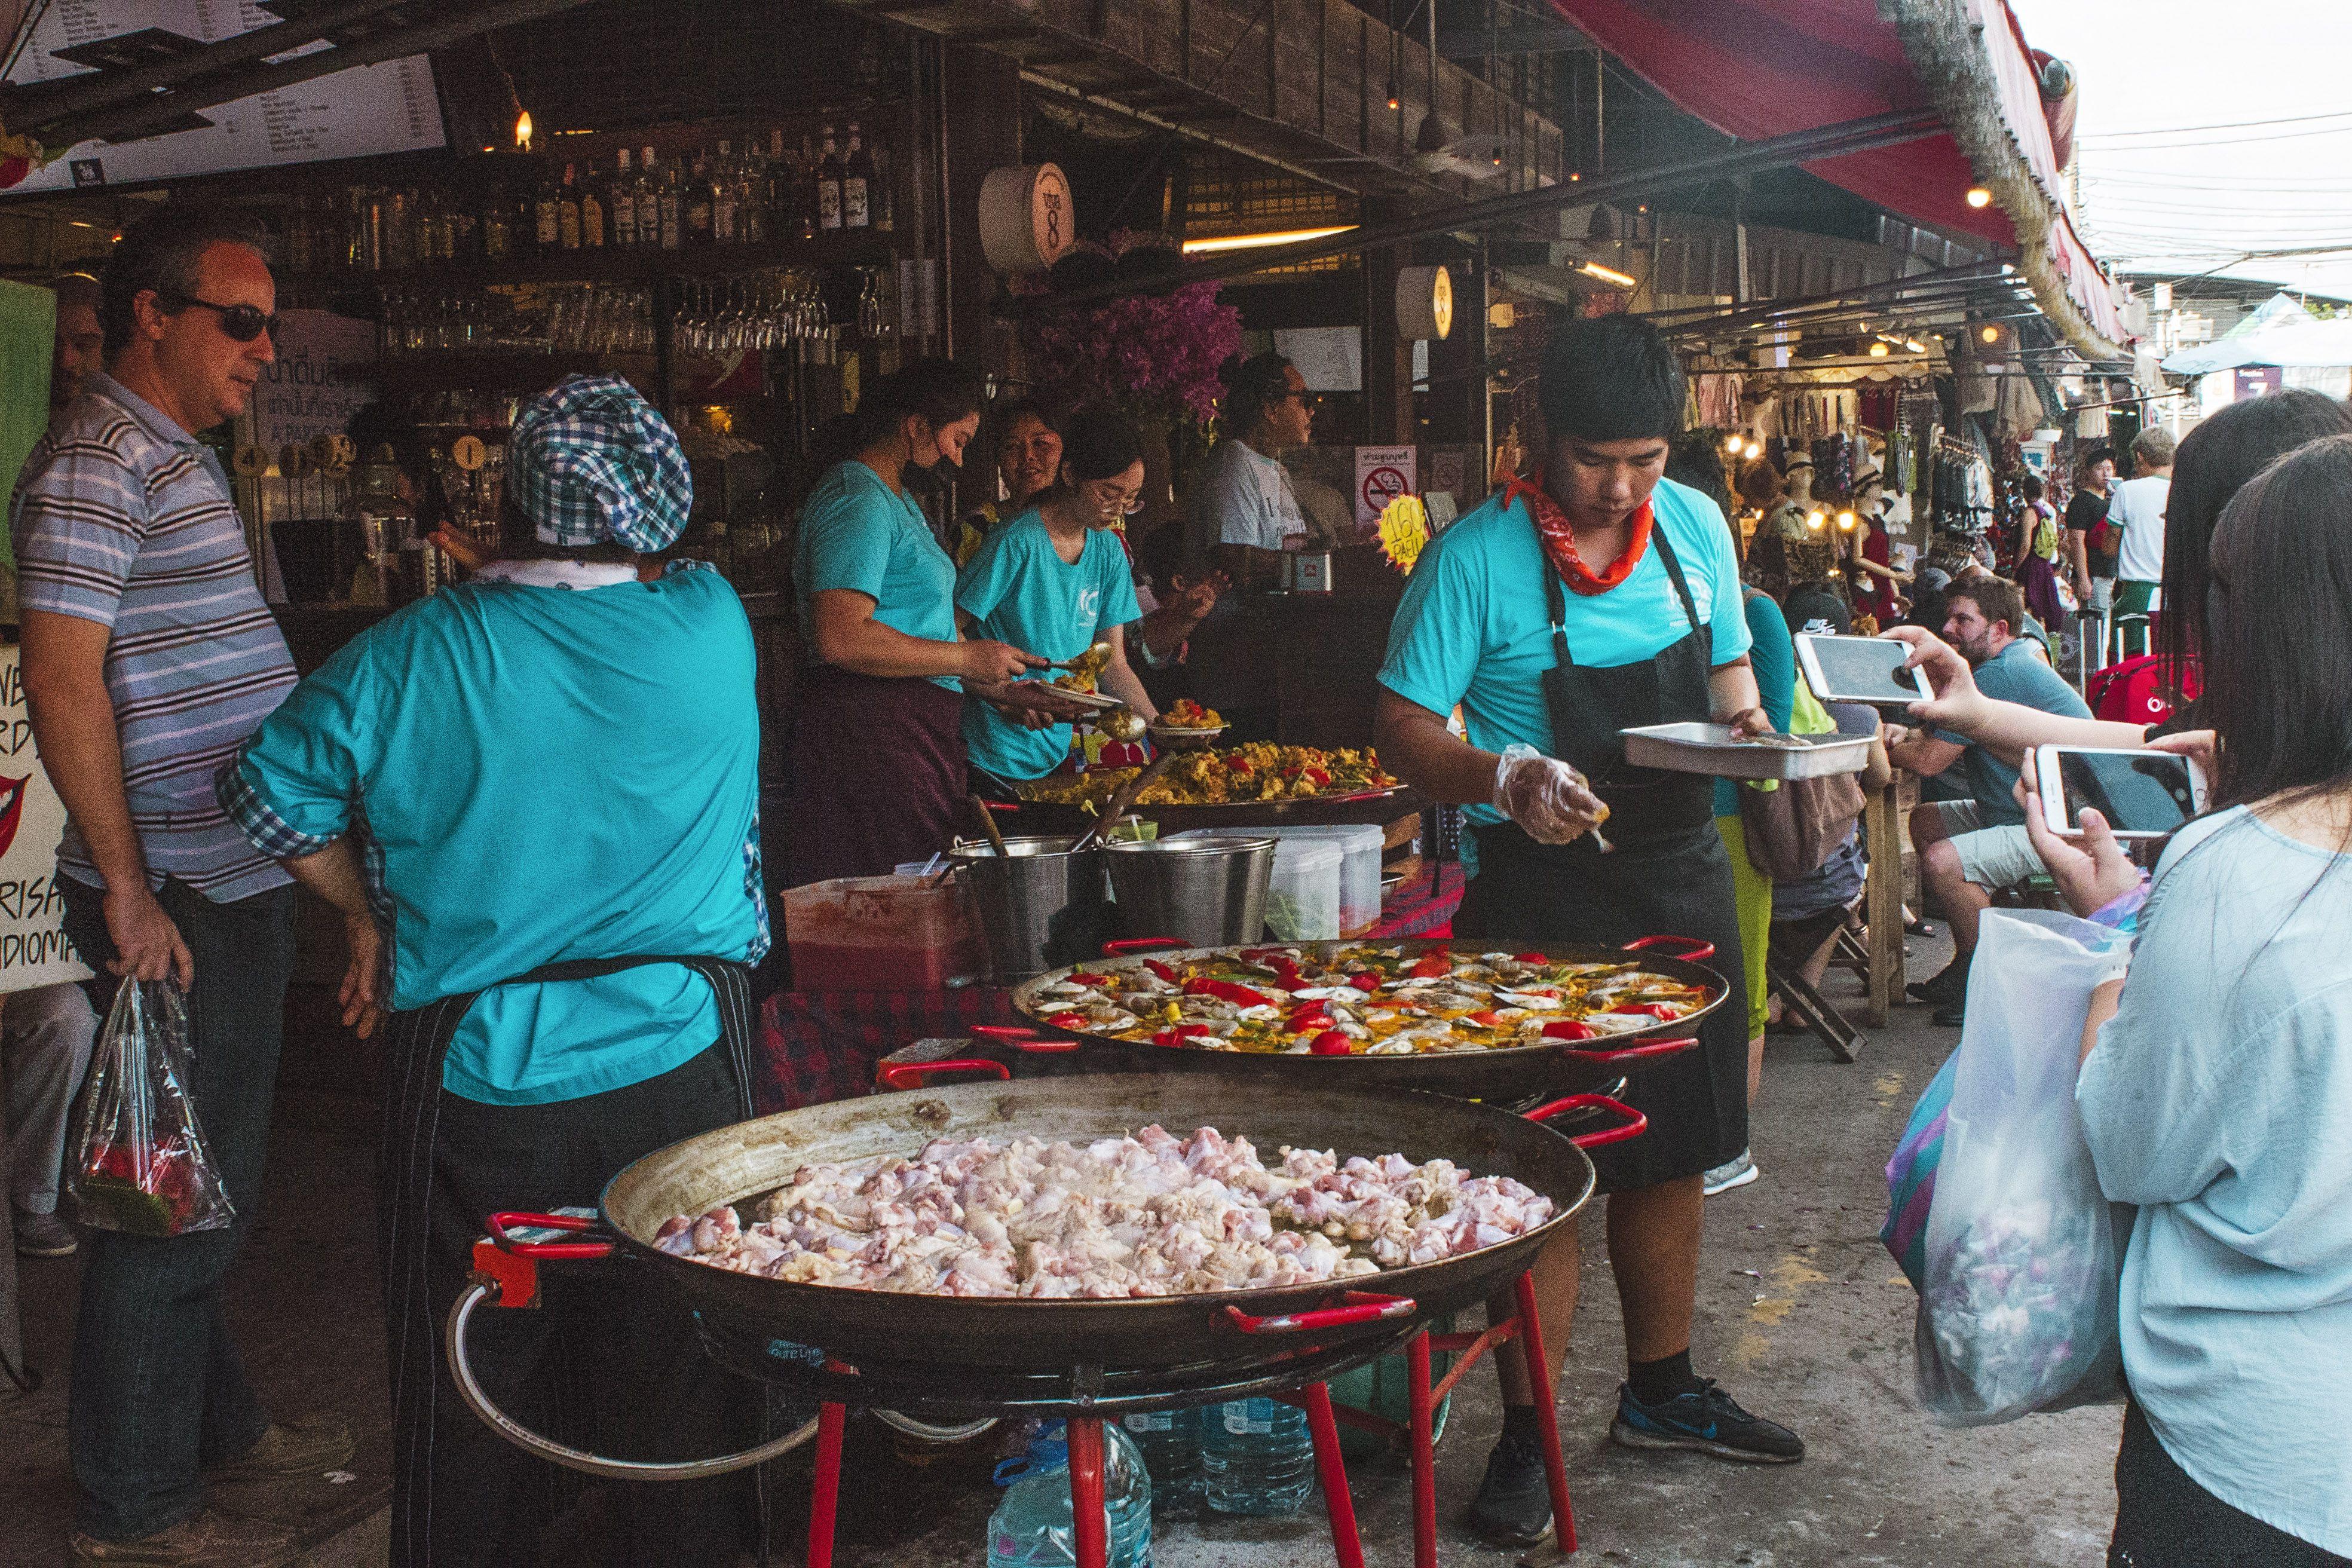 Street food at Chatuchak Market